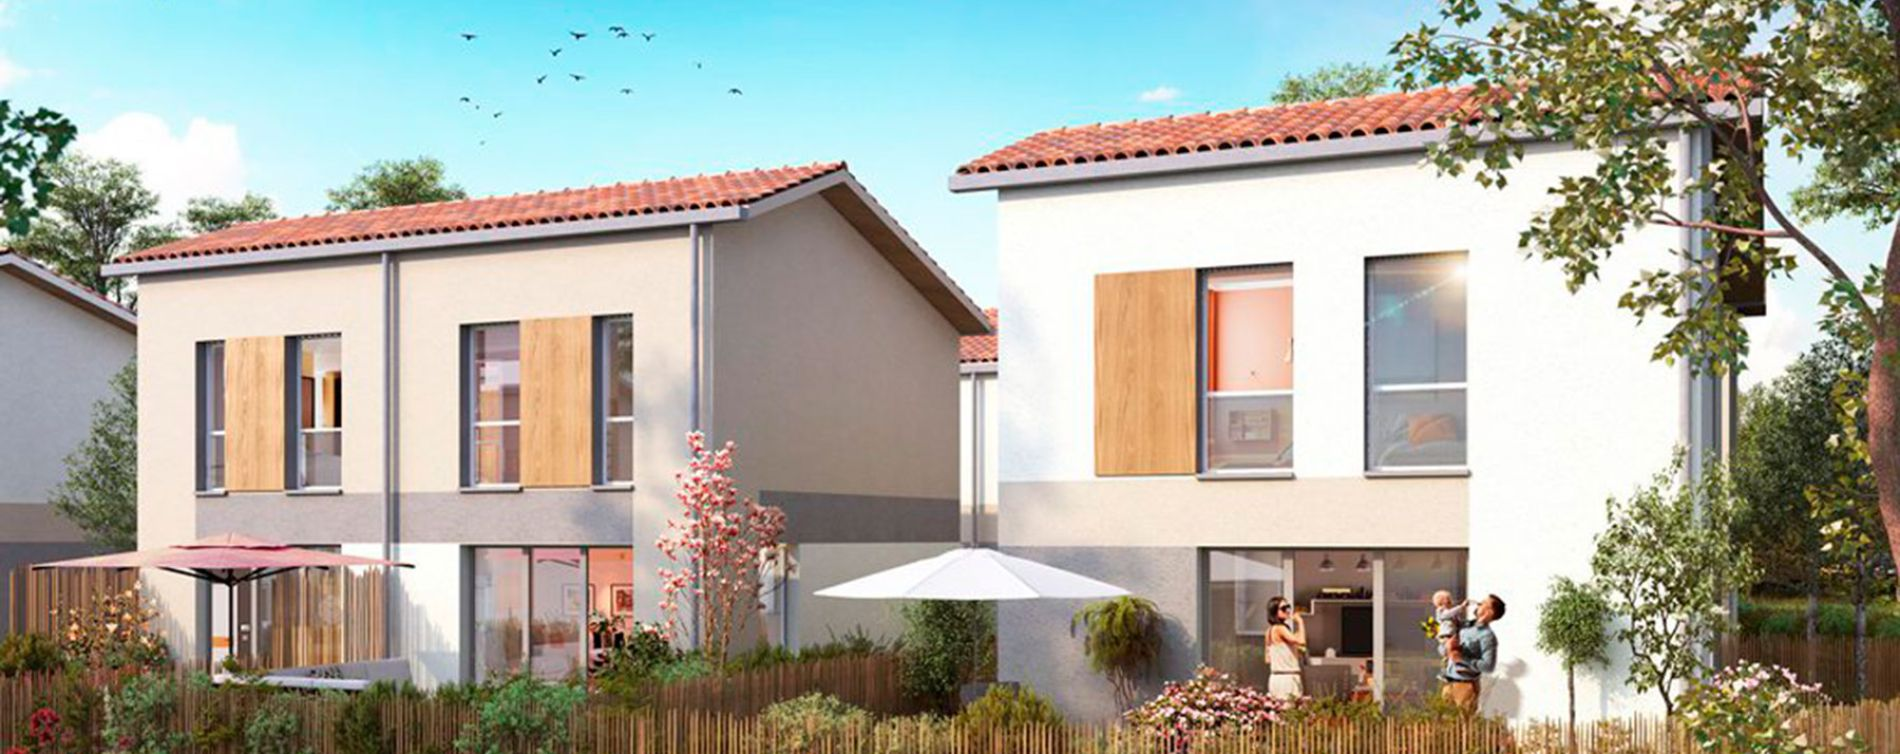 Izon : programme immobilier neuve « Dolce Villa »